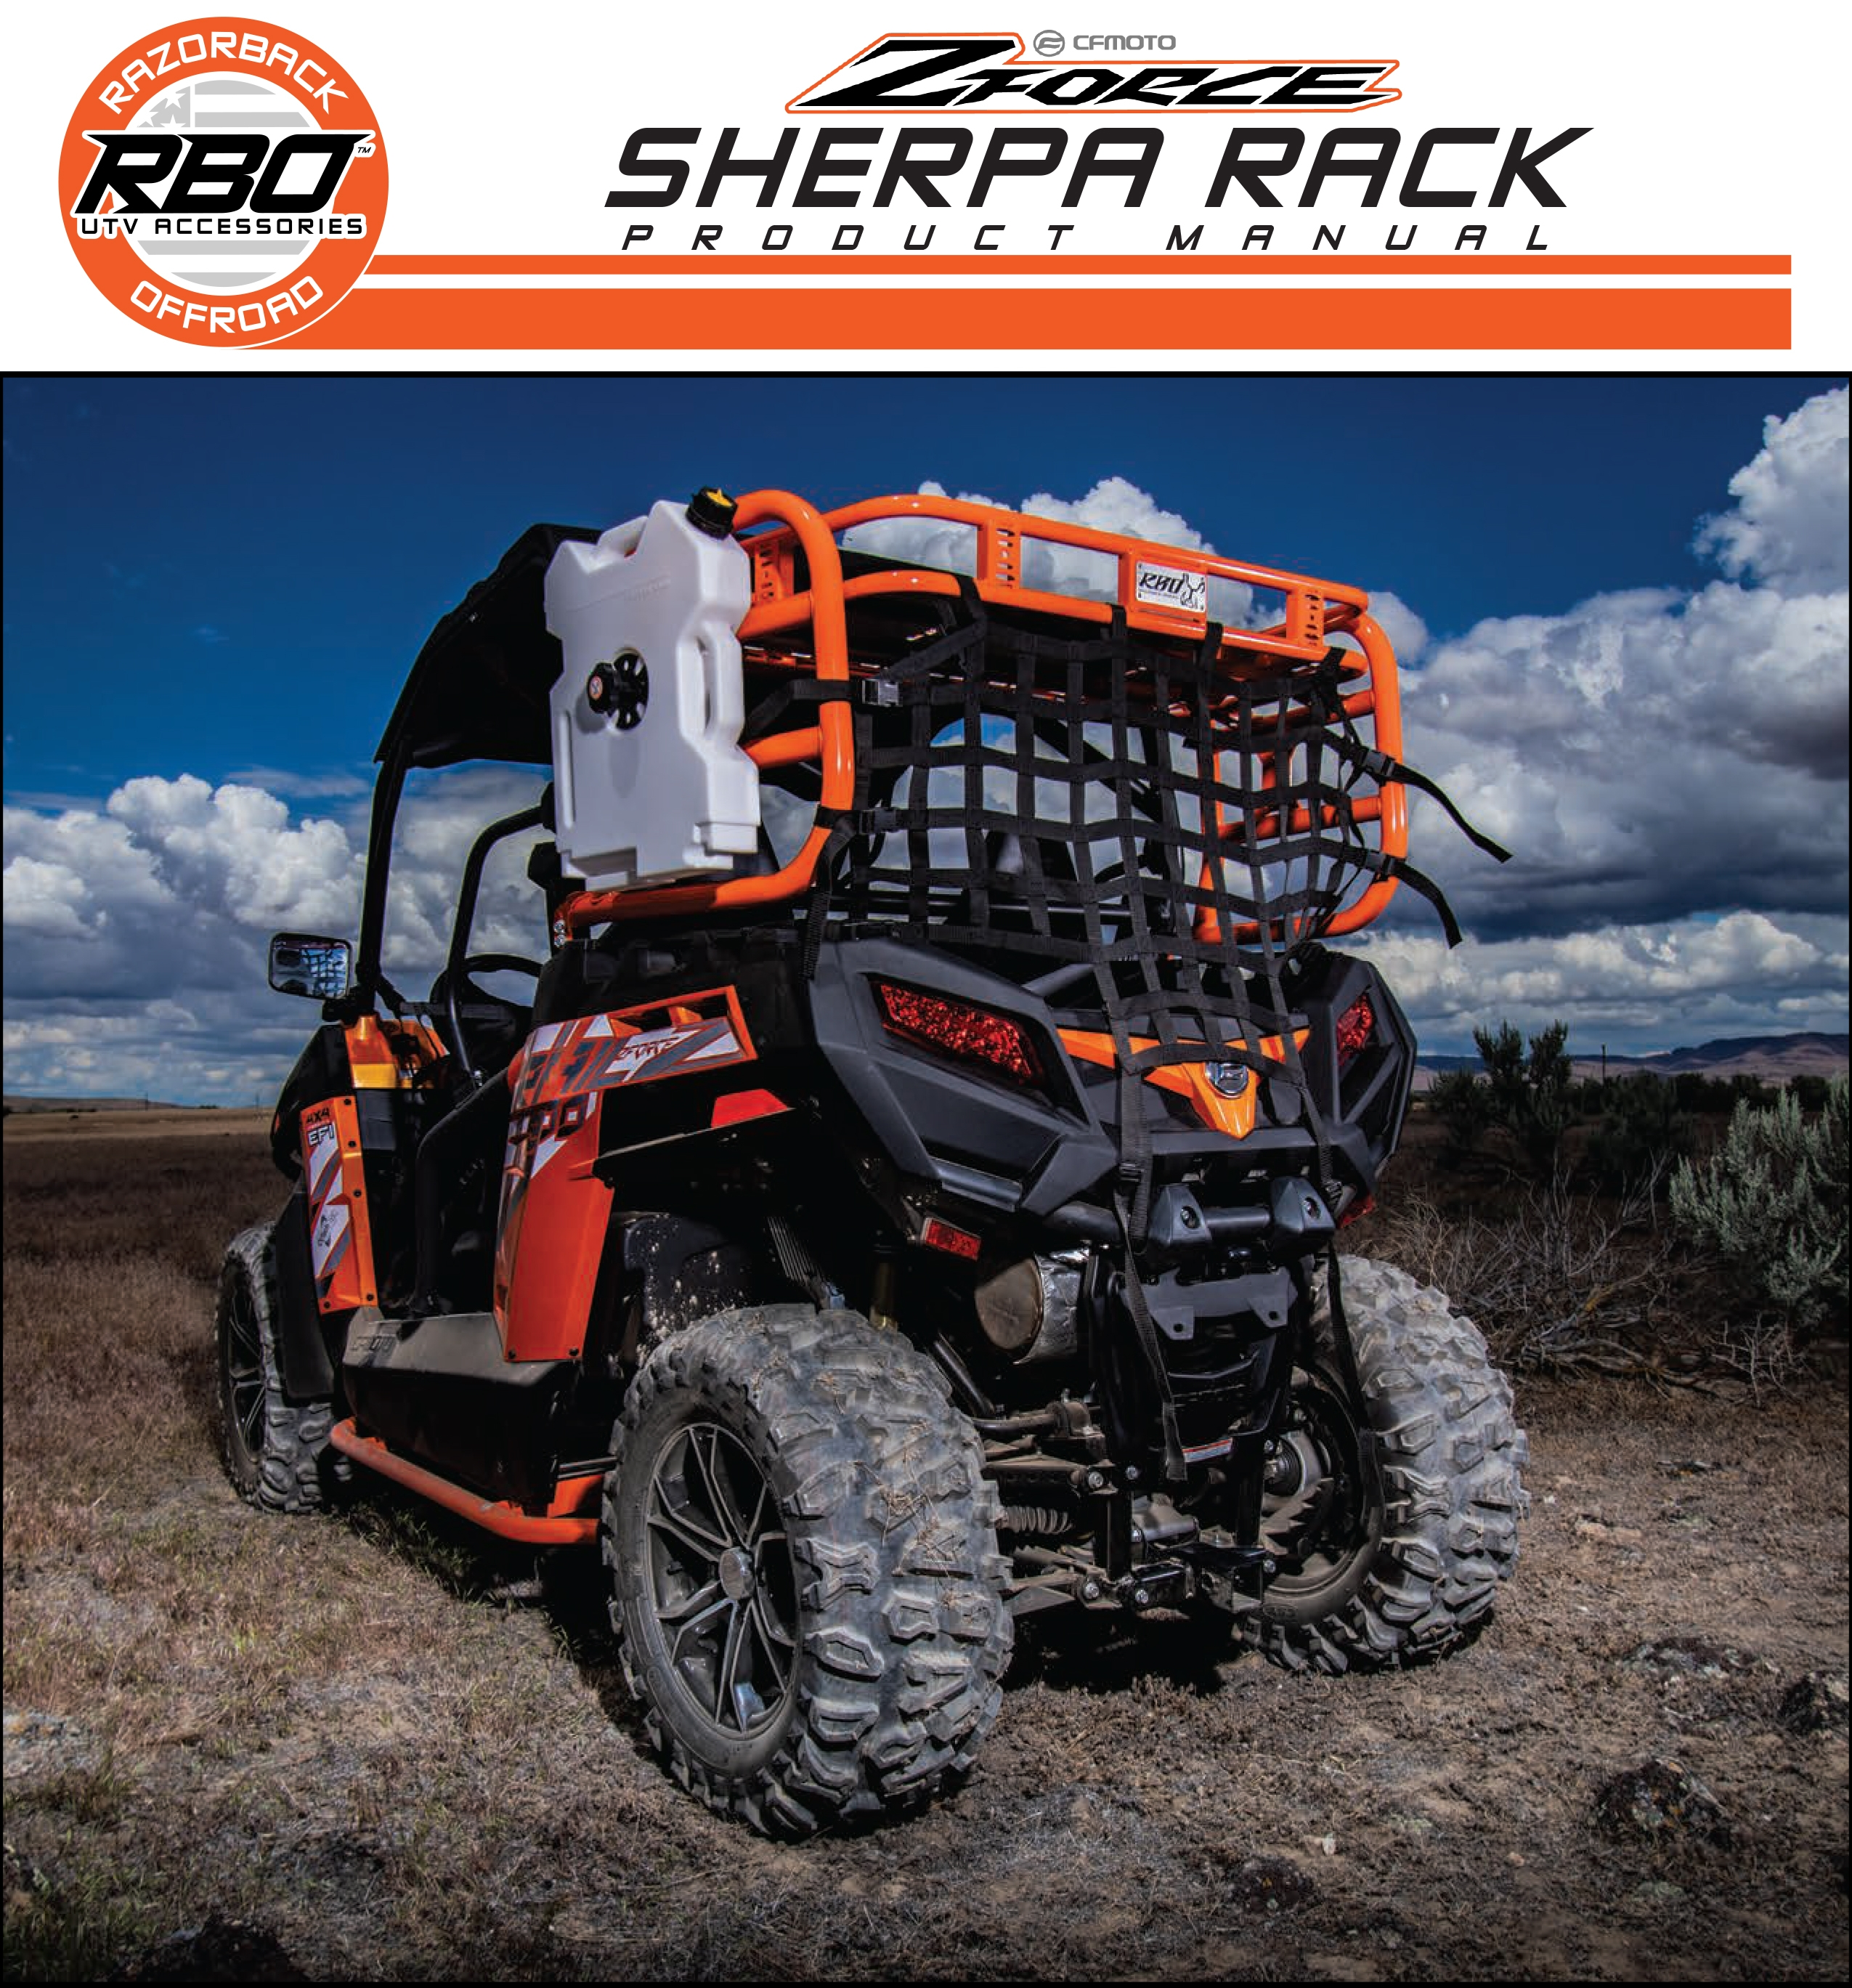 RBO CF Moto ZForce Sherpa Rack Product Manual